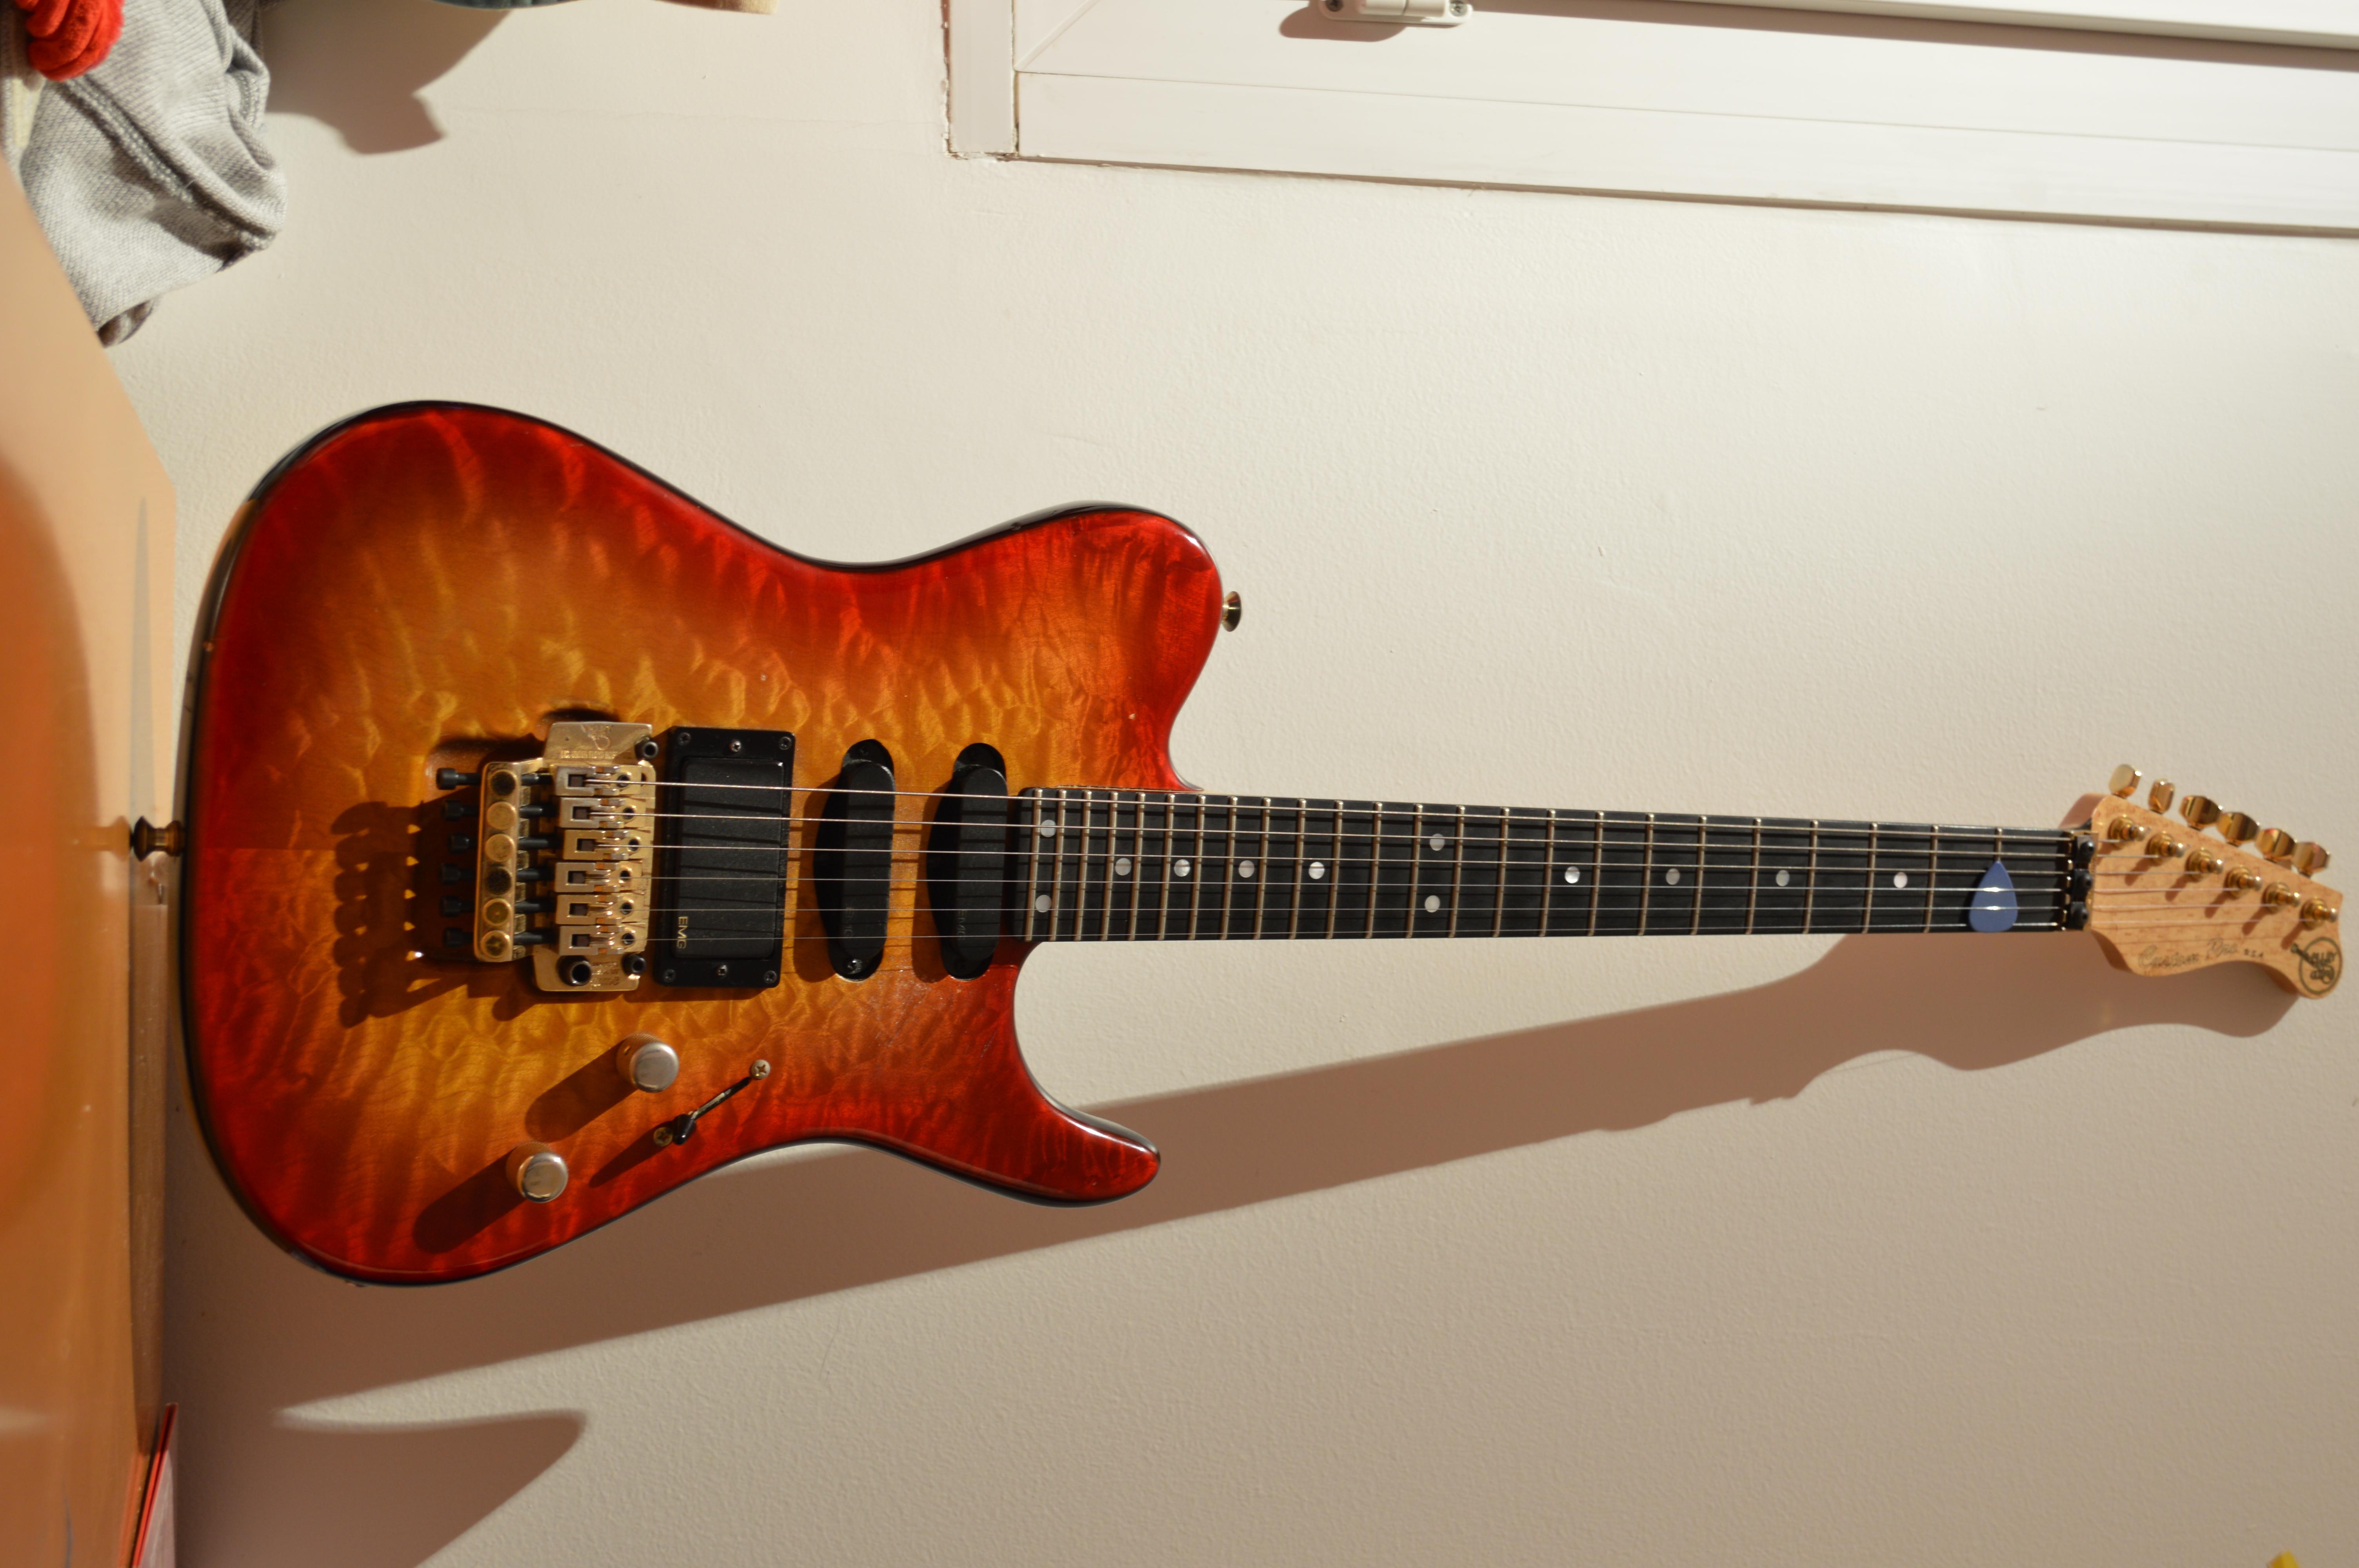 valley arts guitars custom pro image 695562 audiofanzine. Black Bedroom Furniture Sets. Home Design Ideas